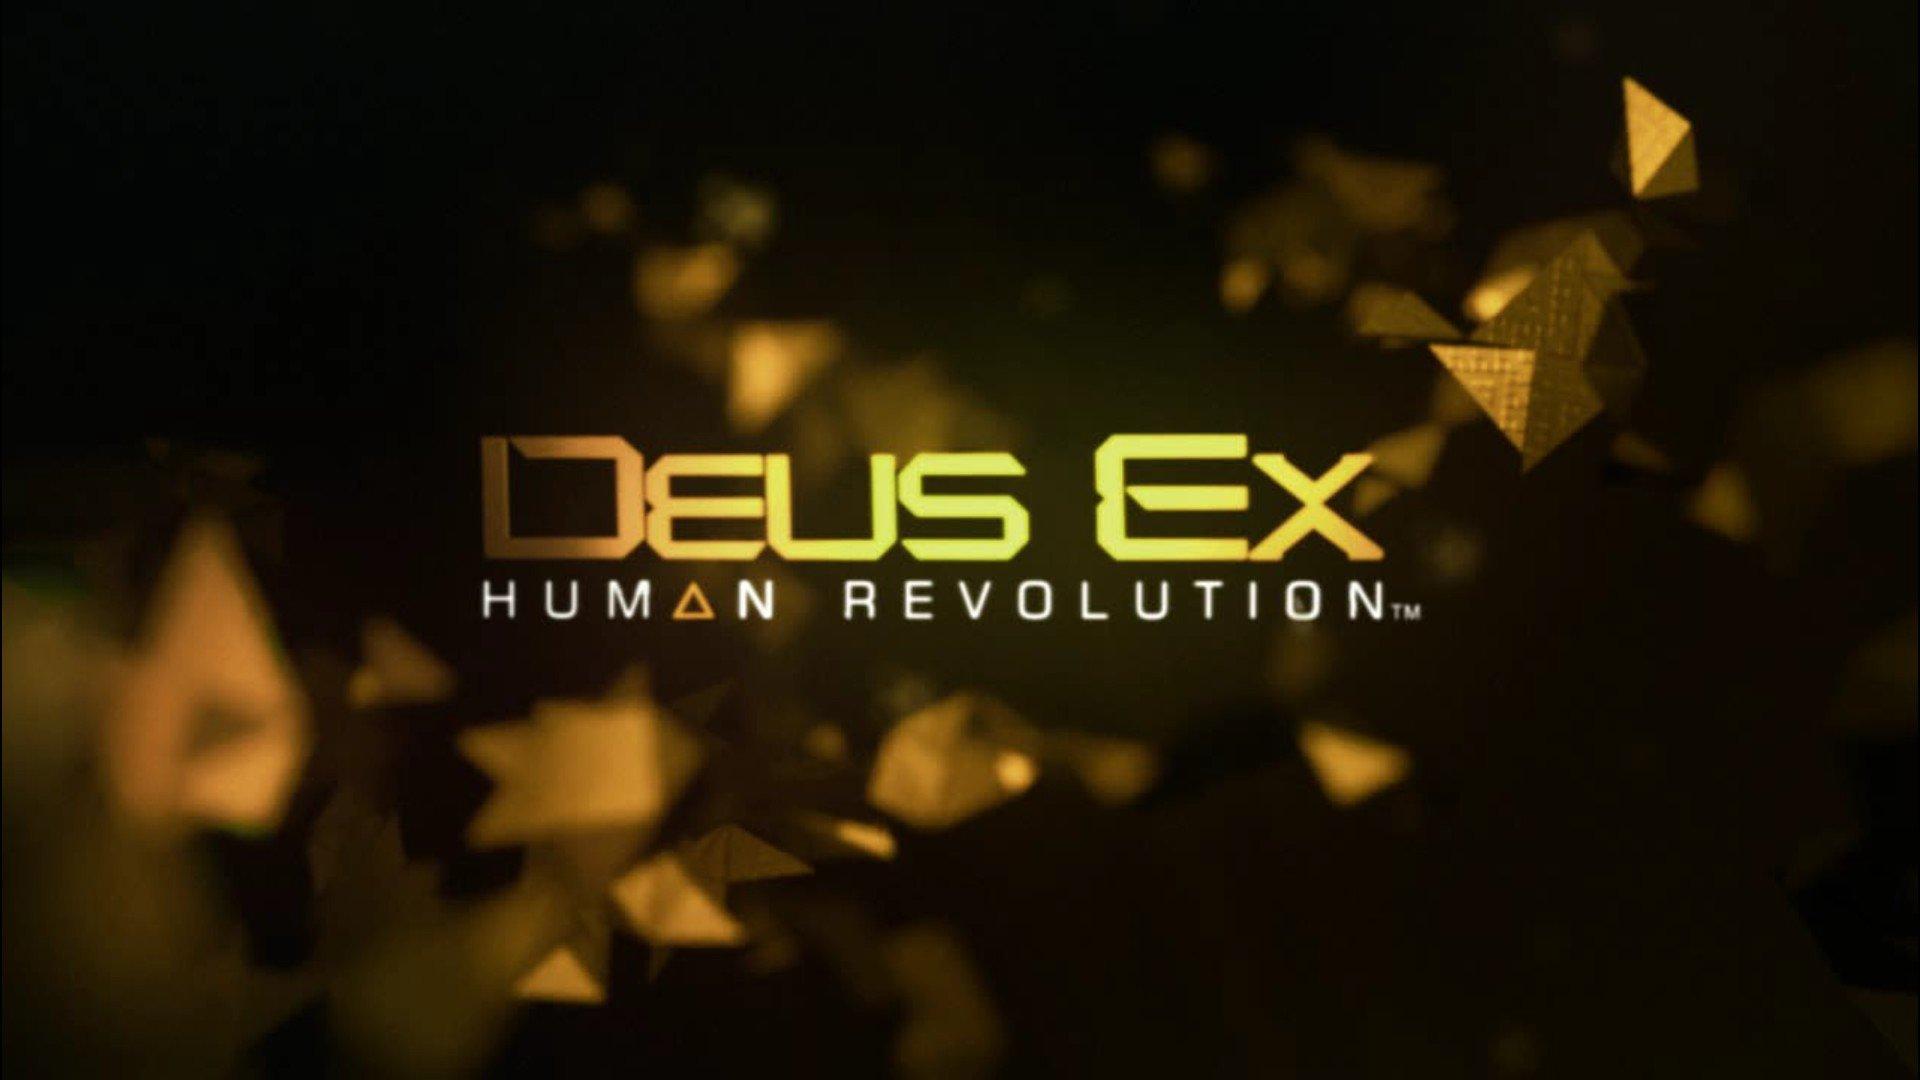 Deus Ex Human Revolution Quotes Wallpaper Game Giveaway Deus Ex Human Revolution Thebiem